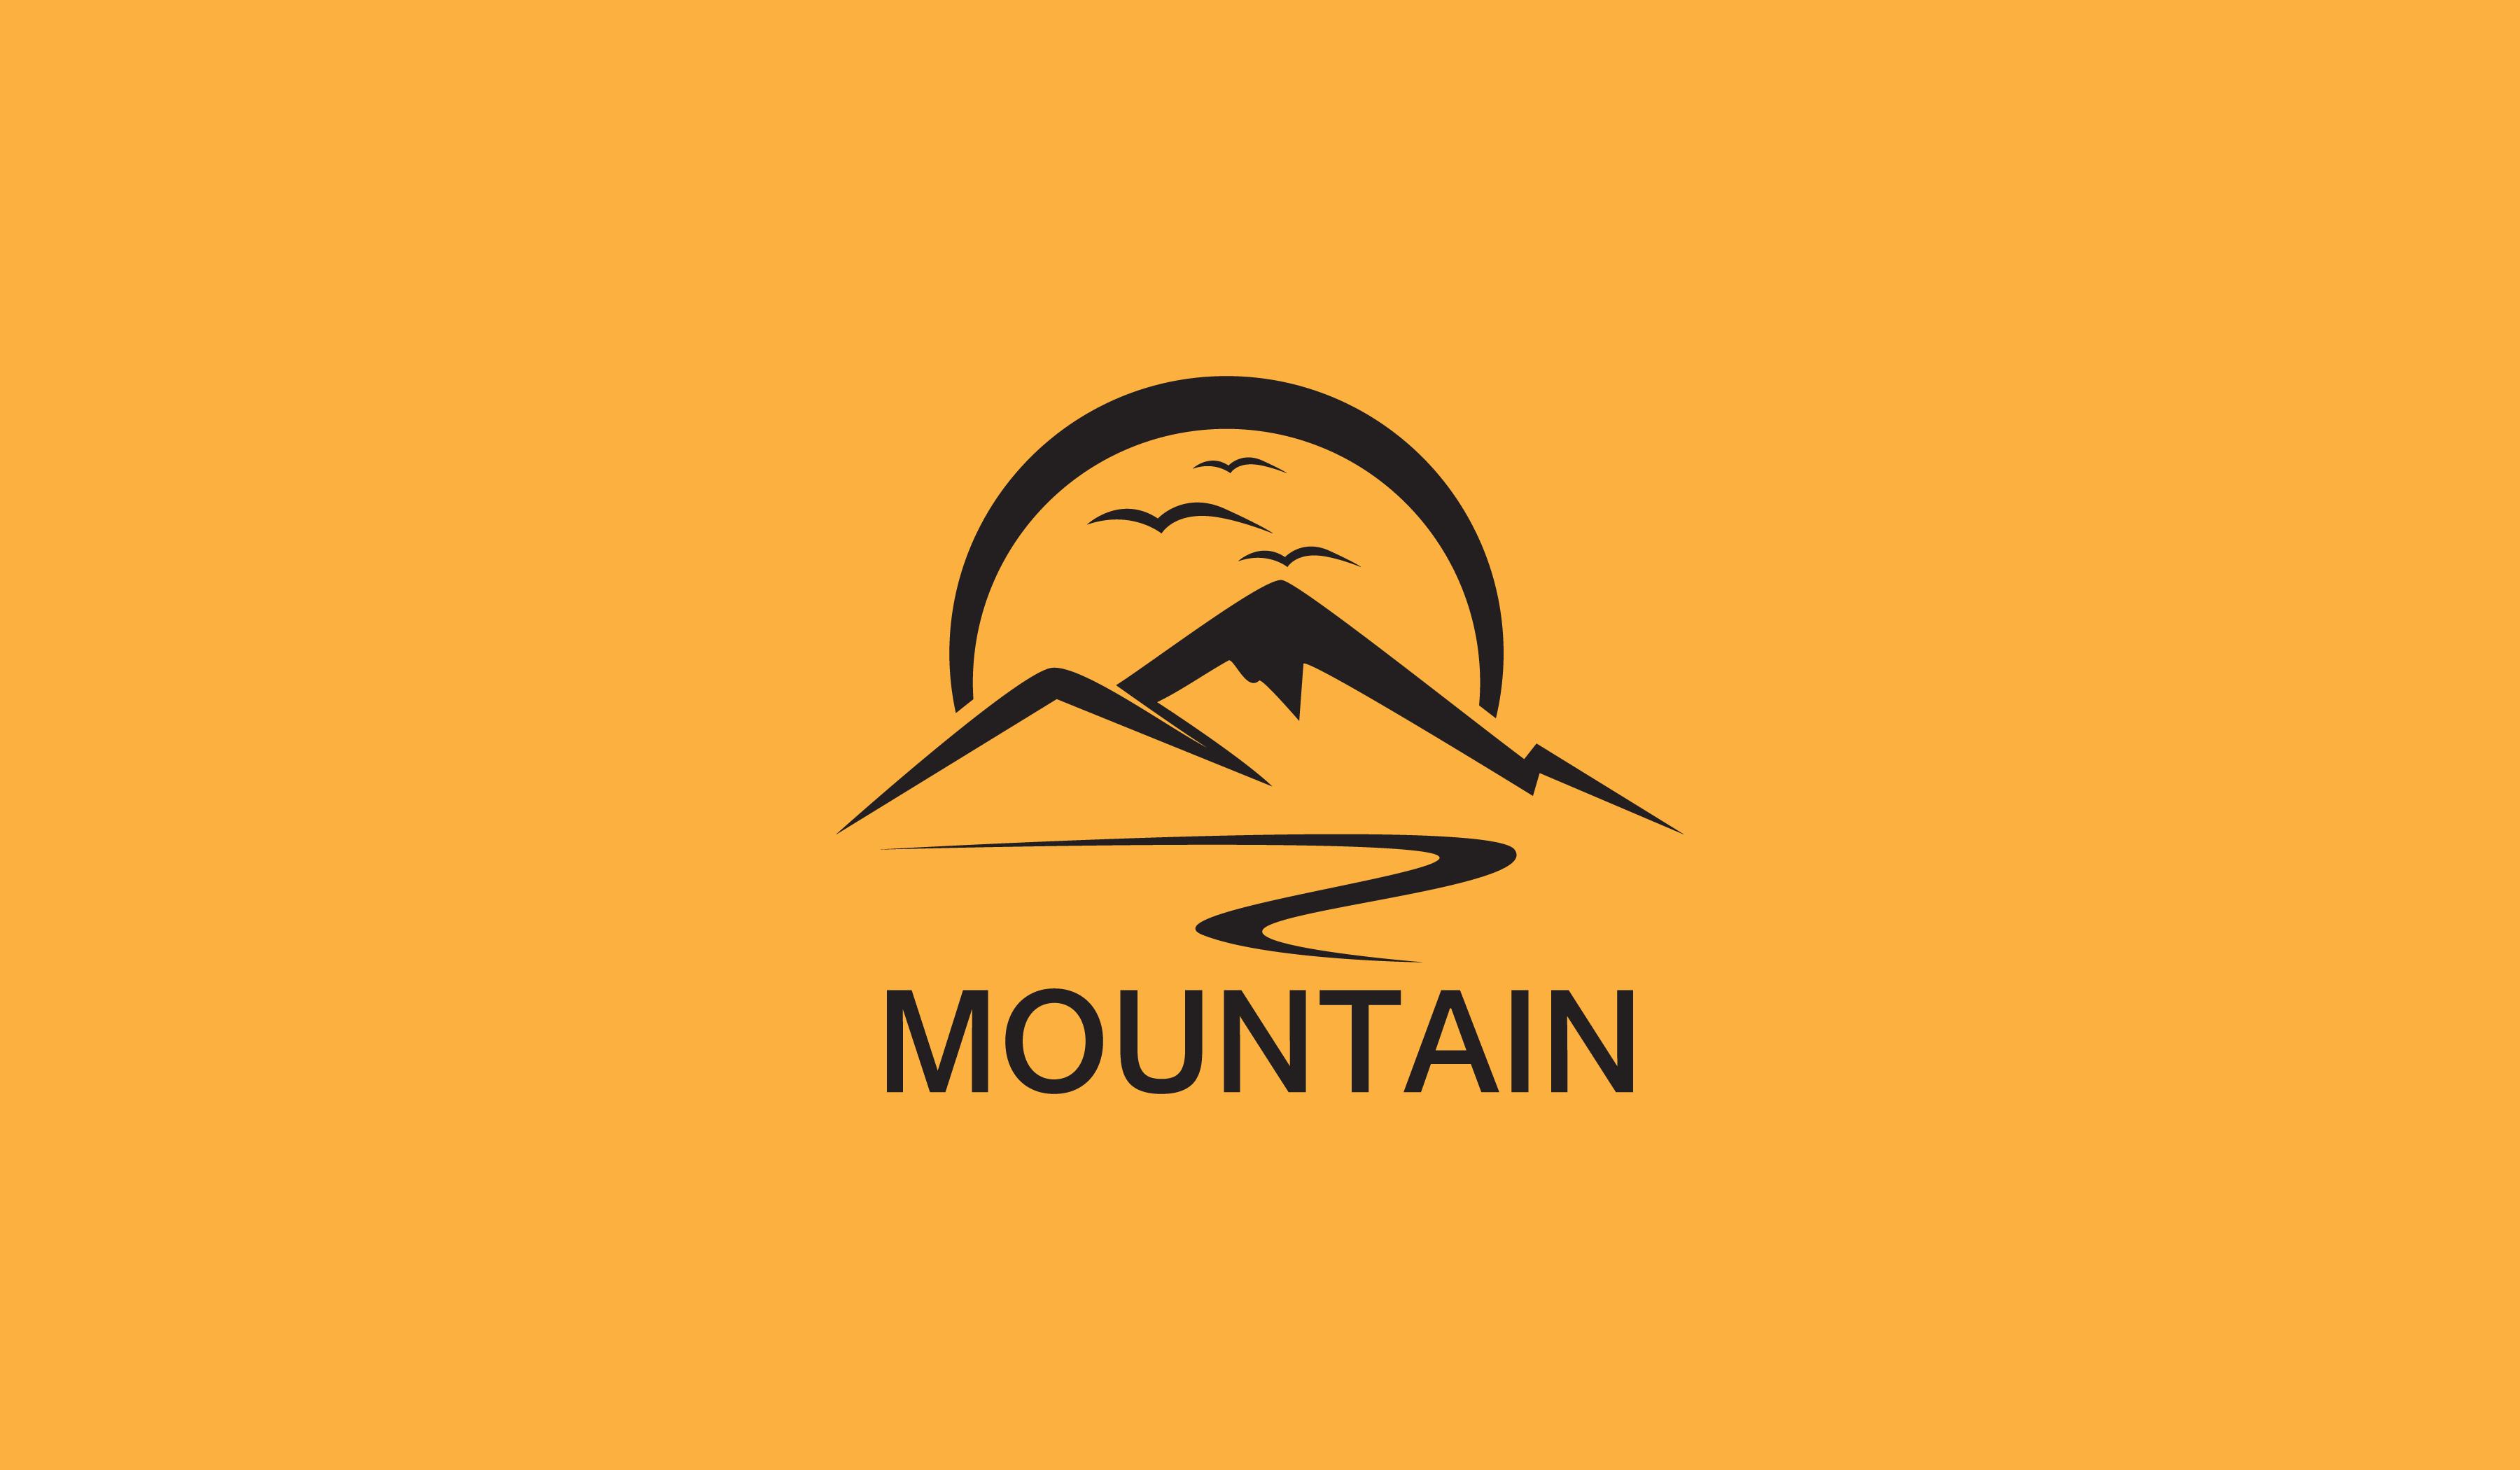 I will design a professional modern minimalist logo design